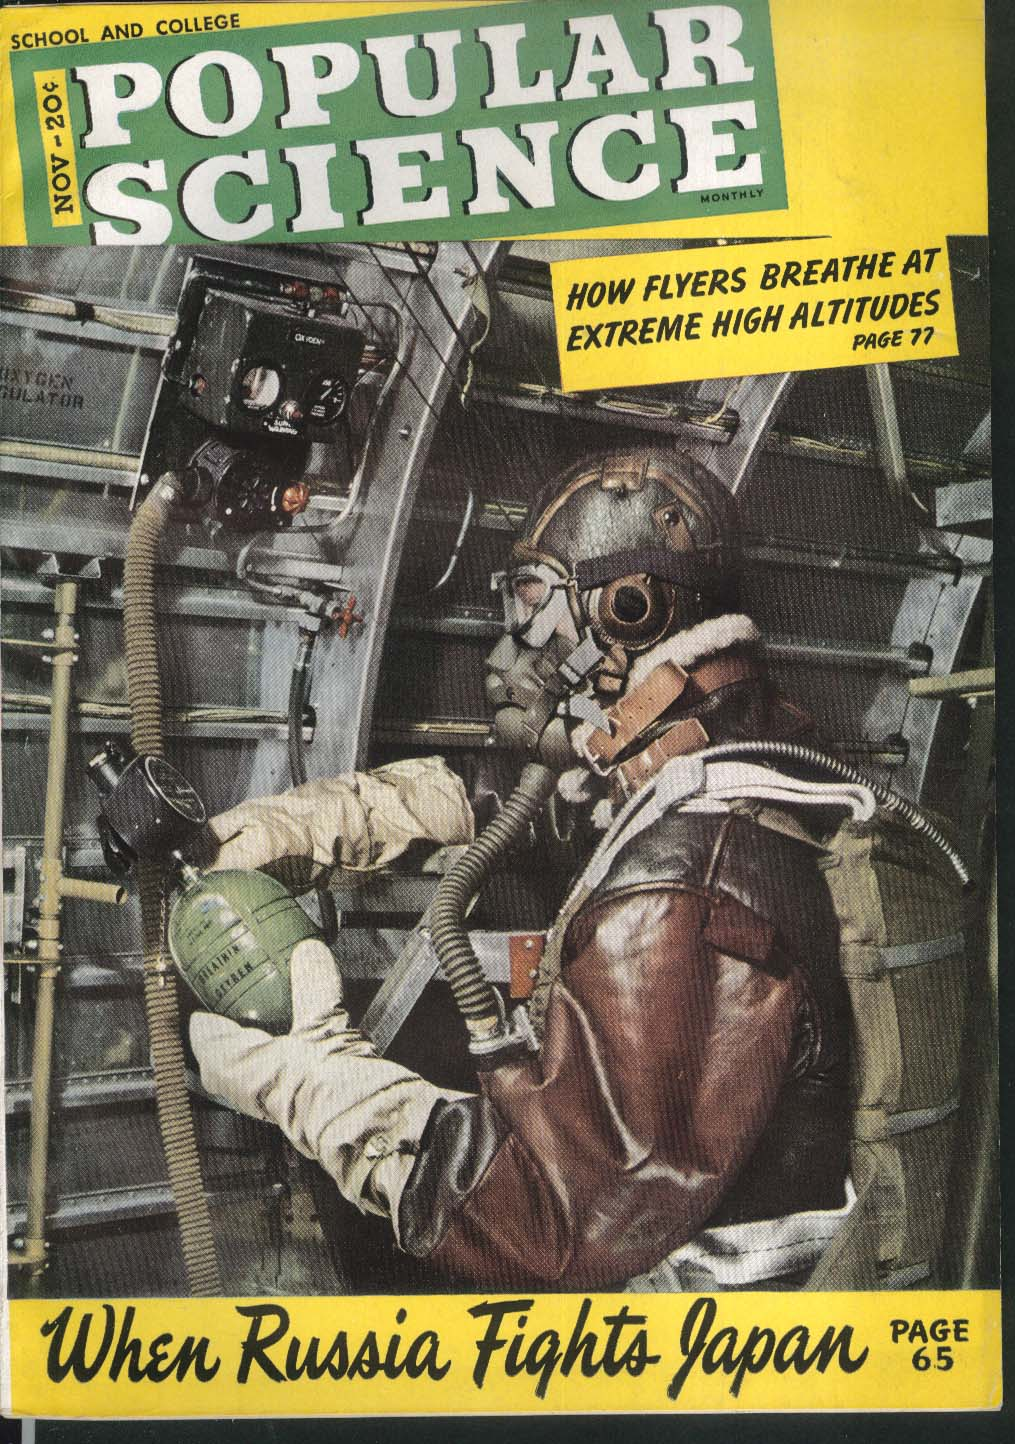 POPULAR SCIENCE Pre-Flight Aeronautics Fundamentals Russia vs Japan 11 1943